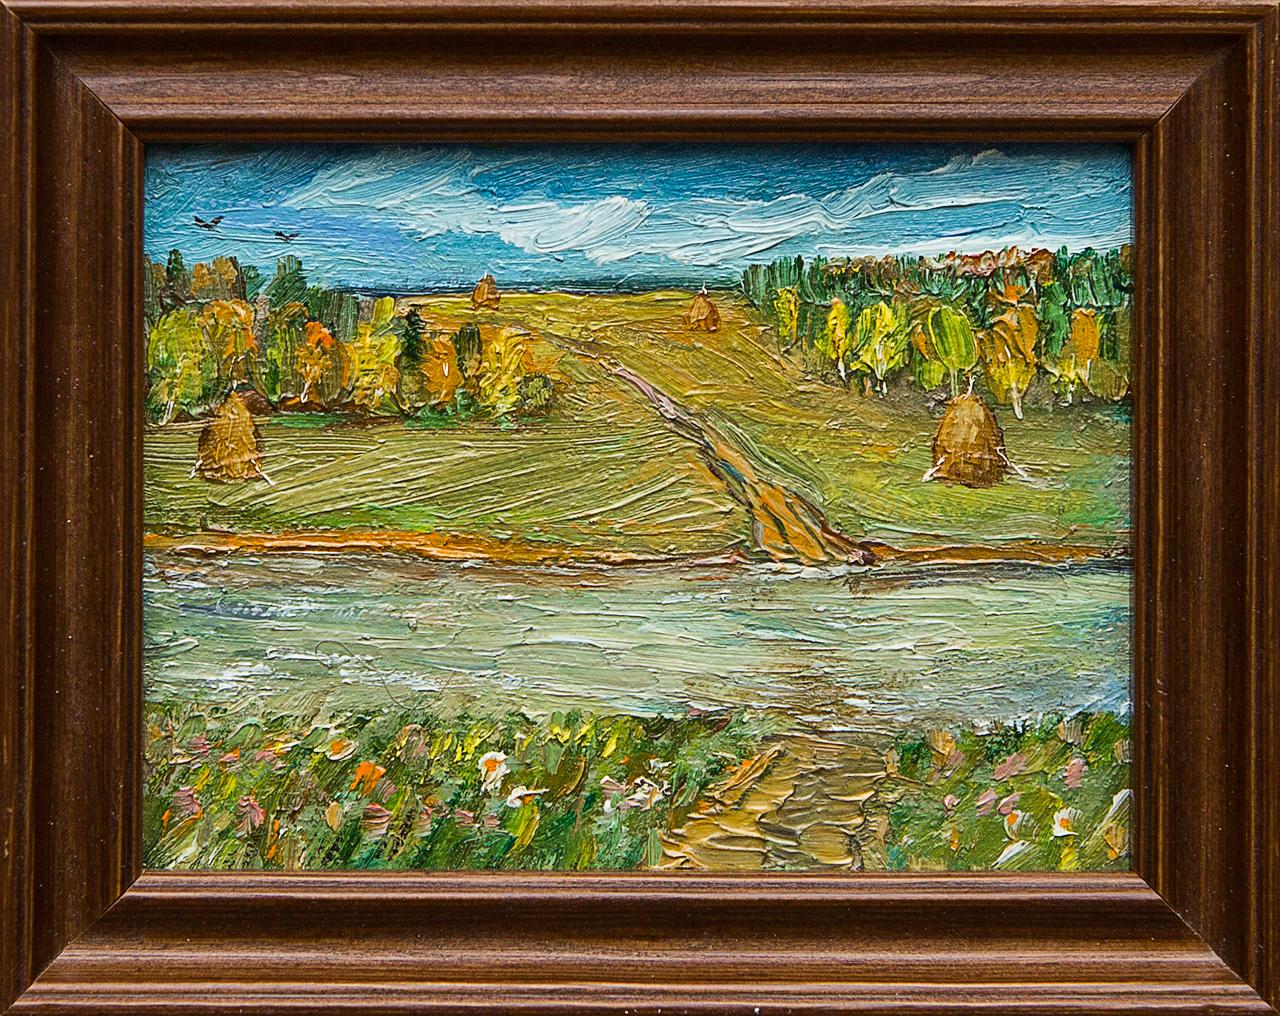 Картина маслом Переправа Мифтахов картина маслом подсолнухи мифтахов